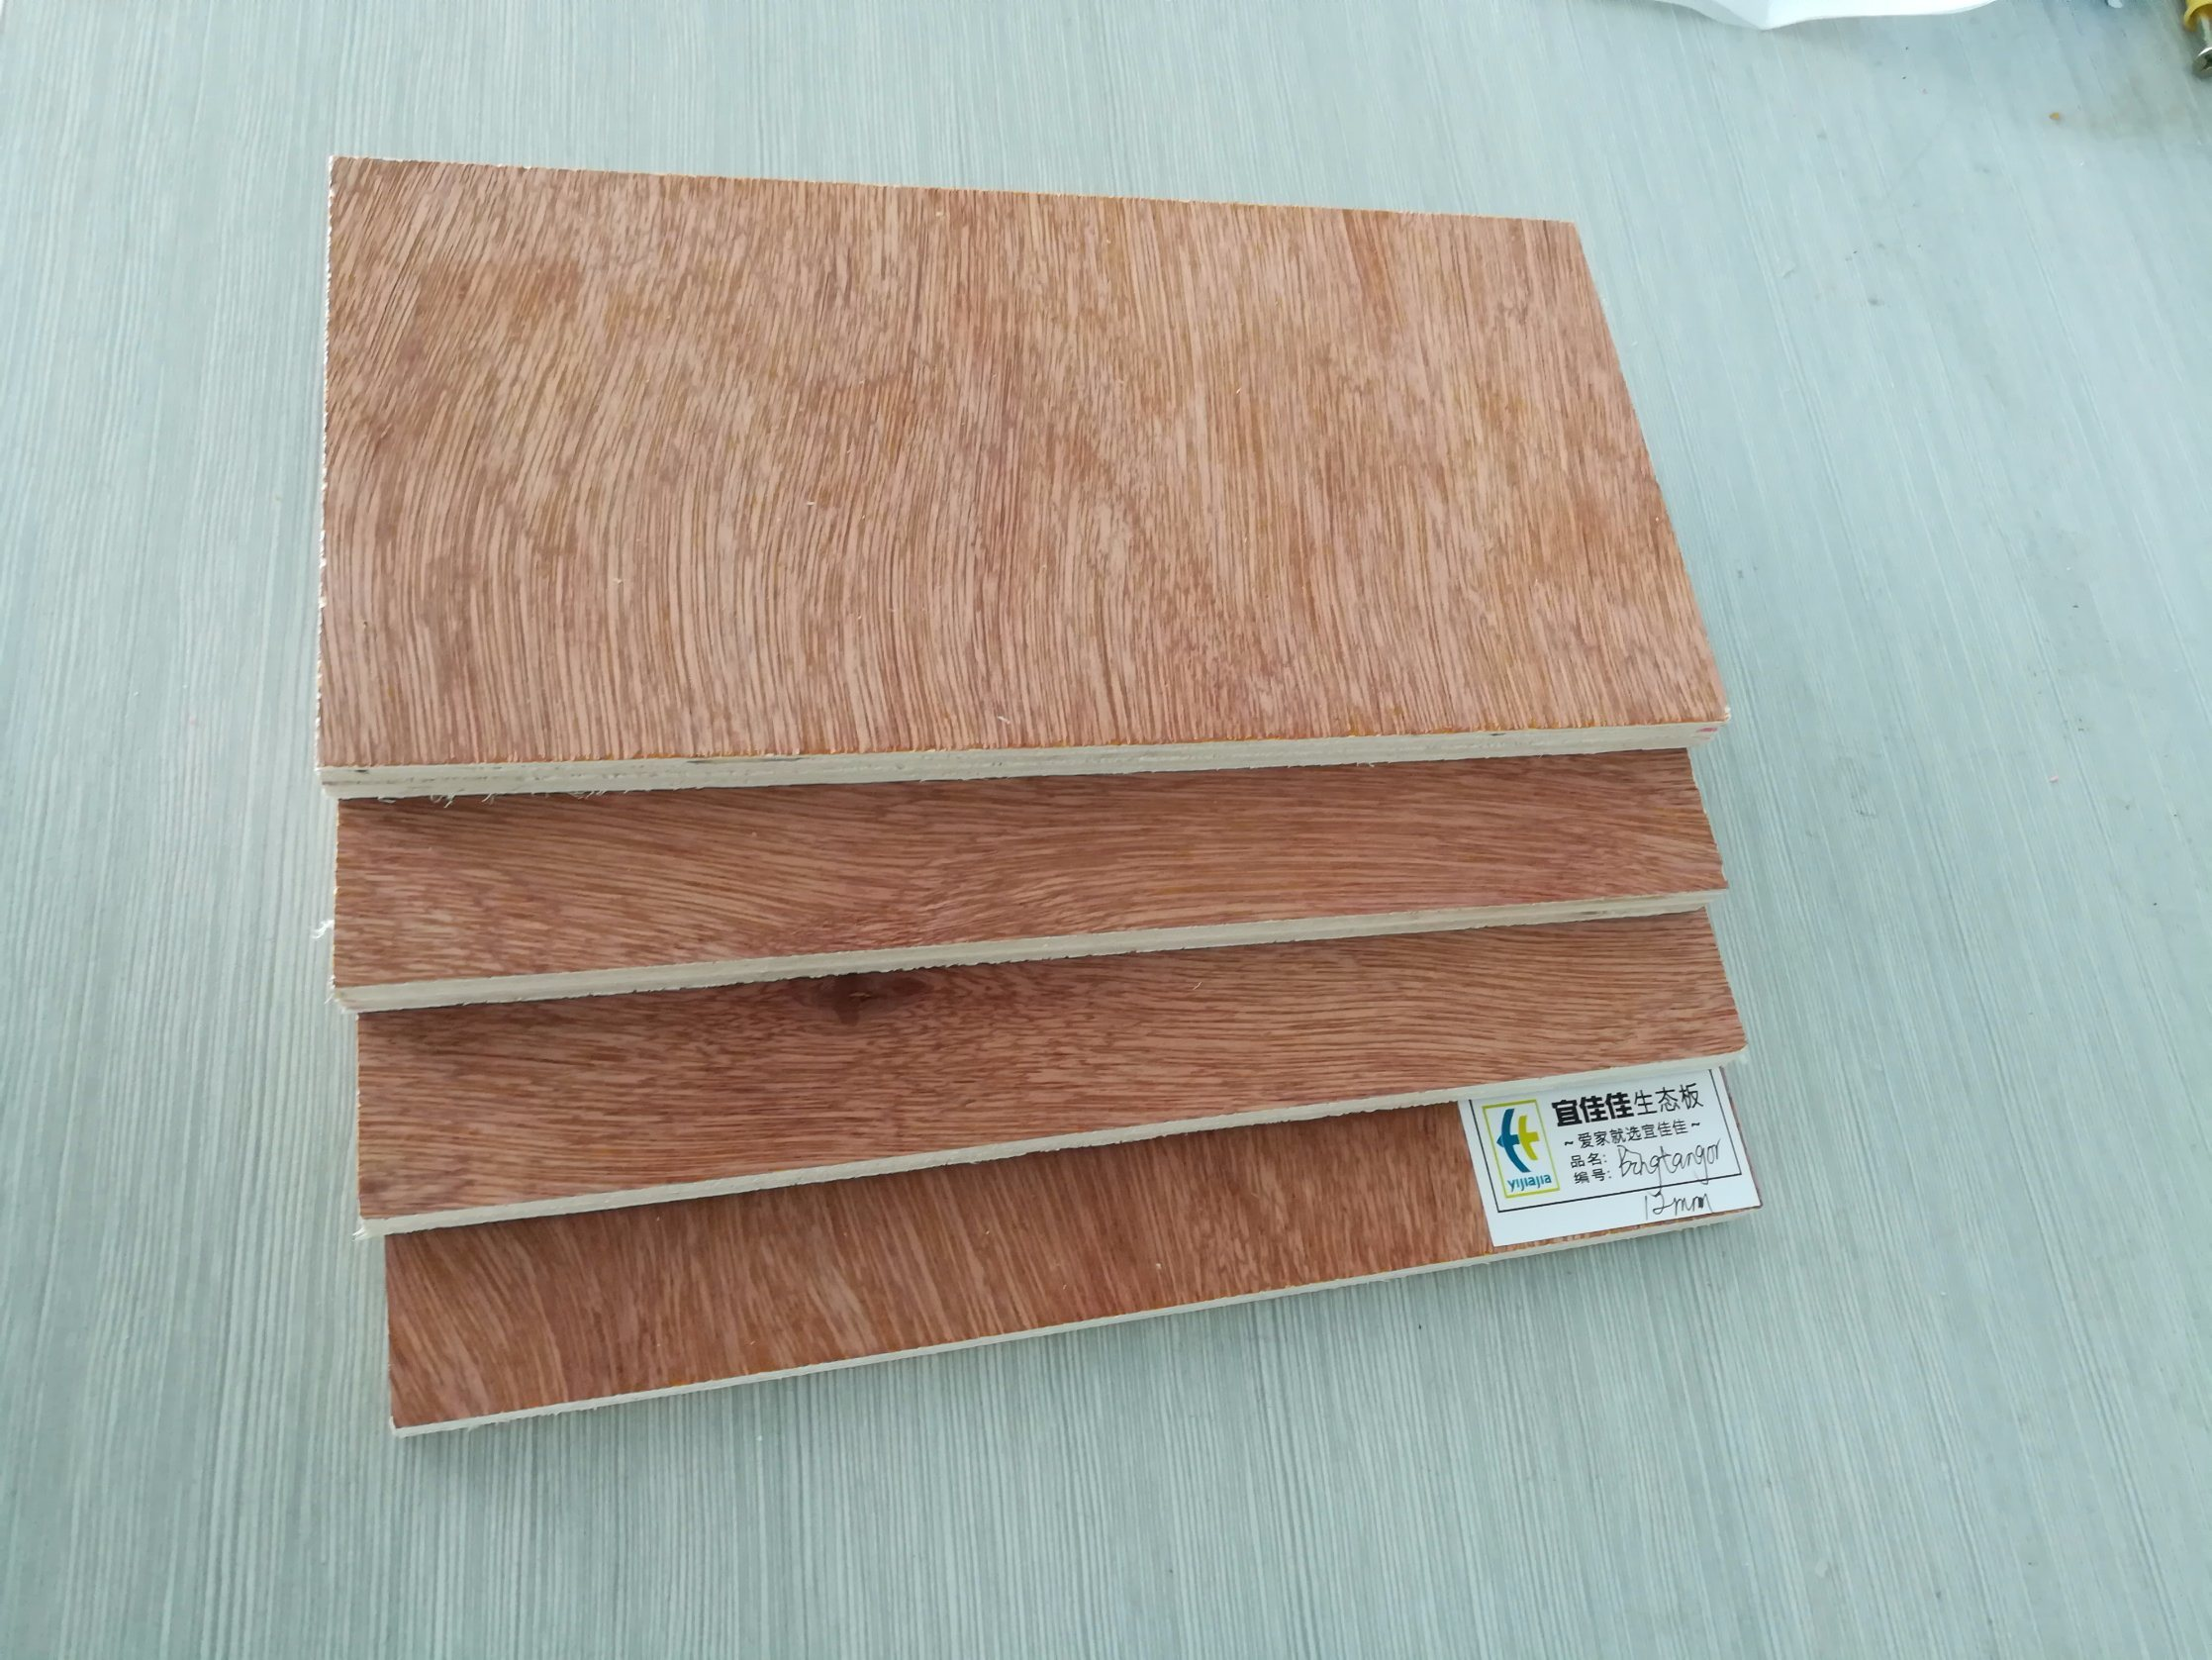 18mm Bintangor Face E2 Glue Combi Core Plywood